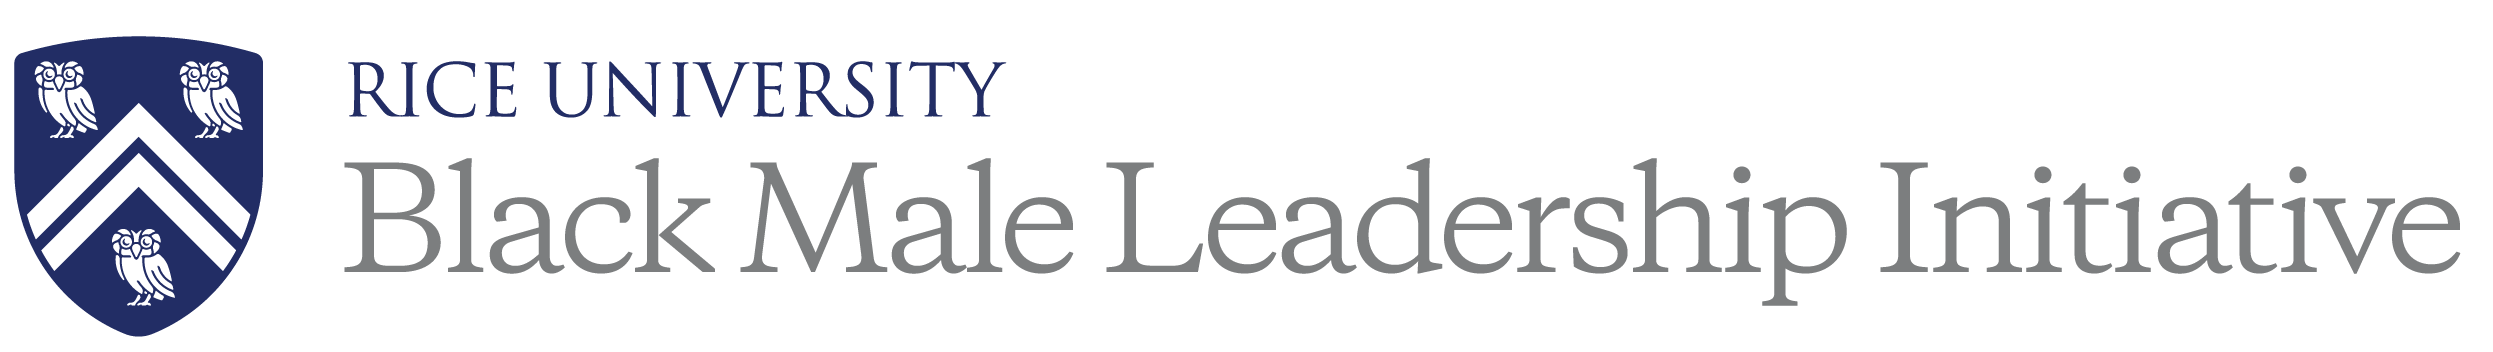 Rice University Black Male Leadership Initiative Logo